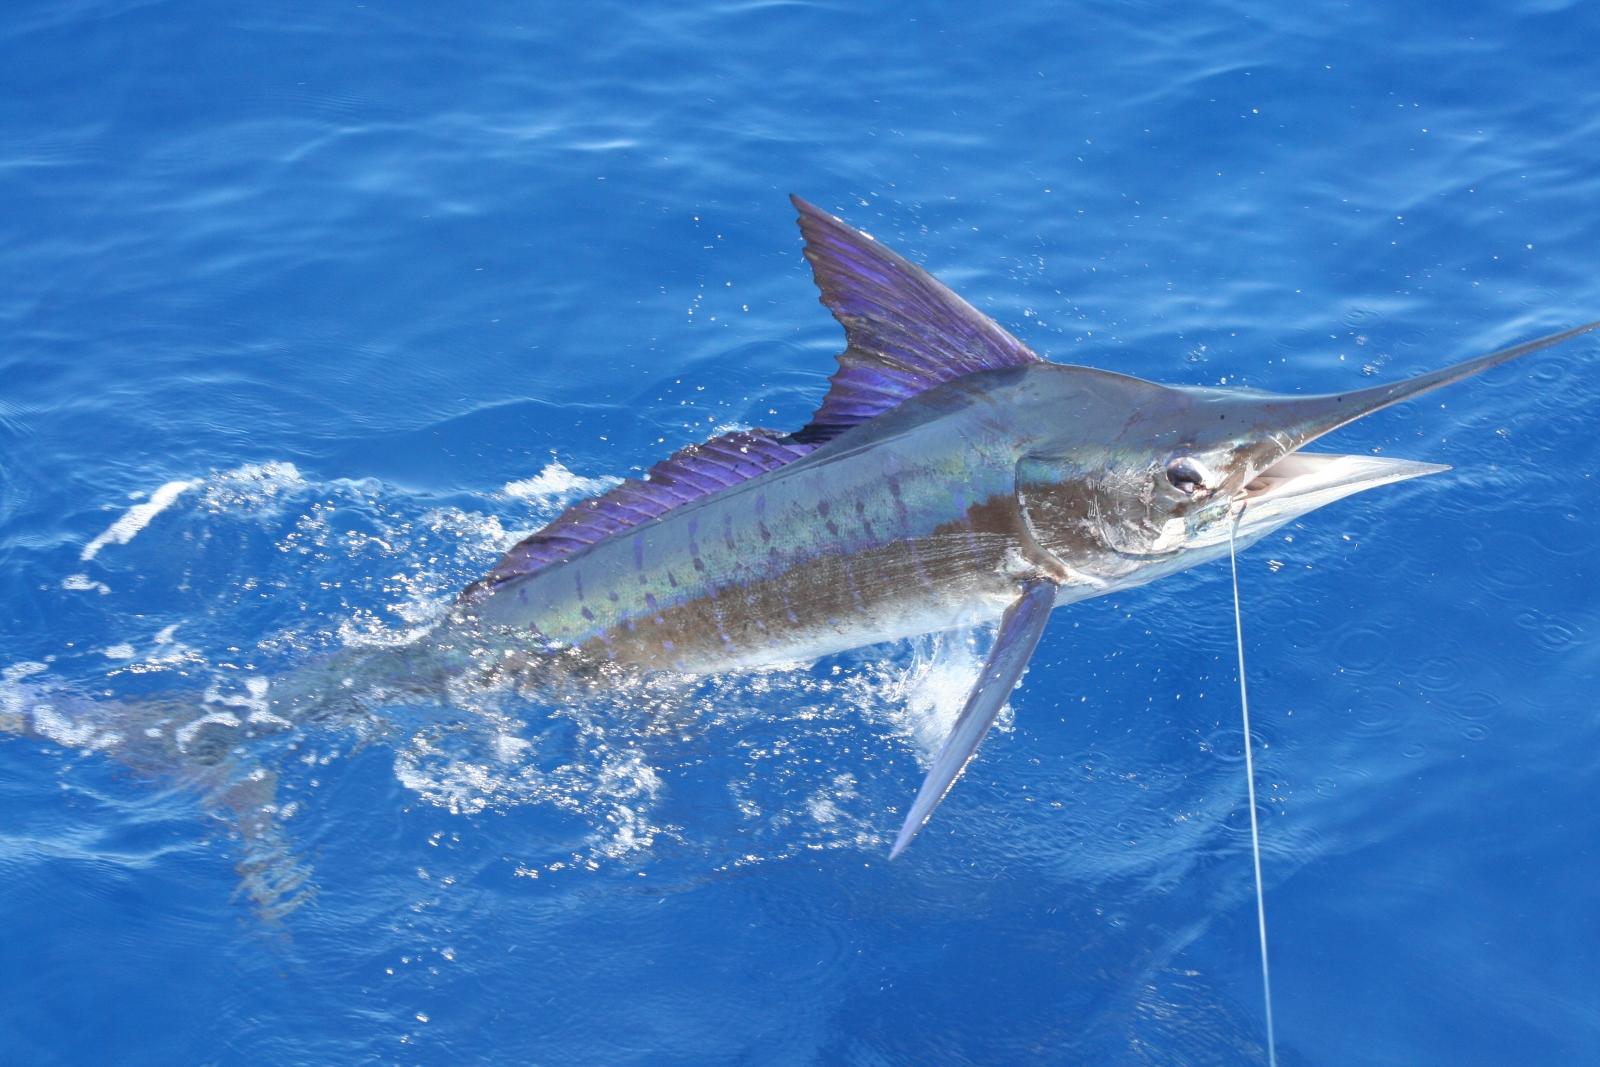 Marlin on fishing line